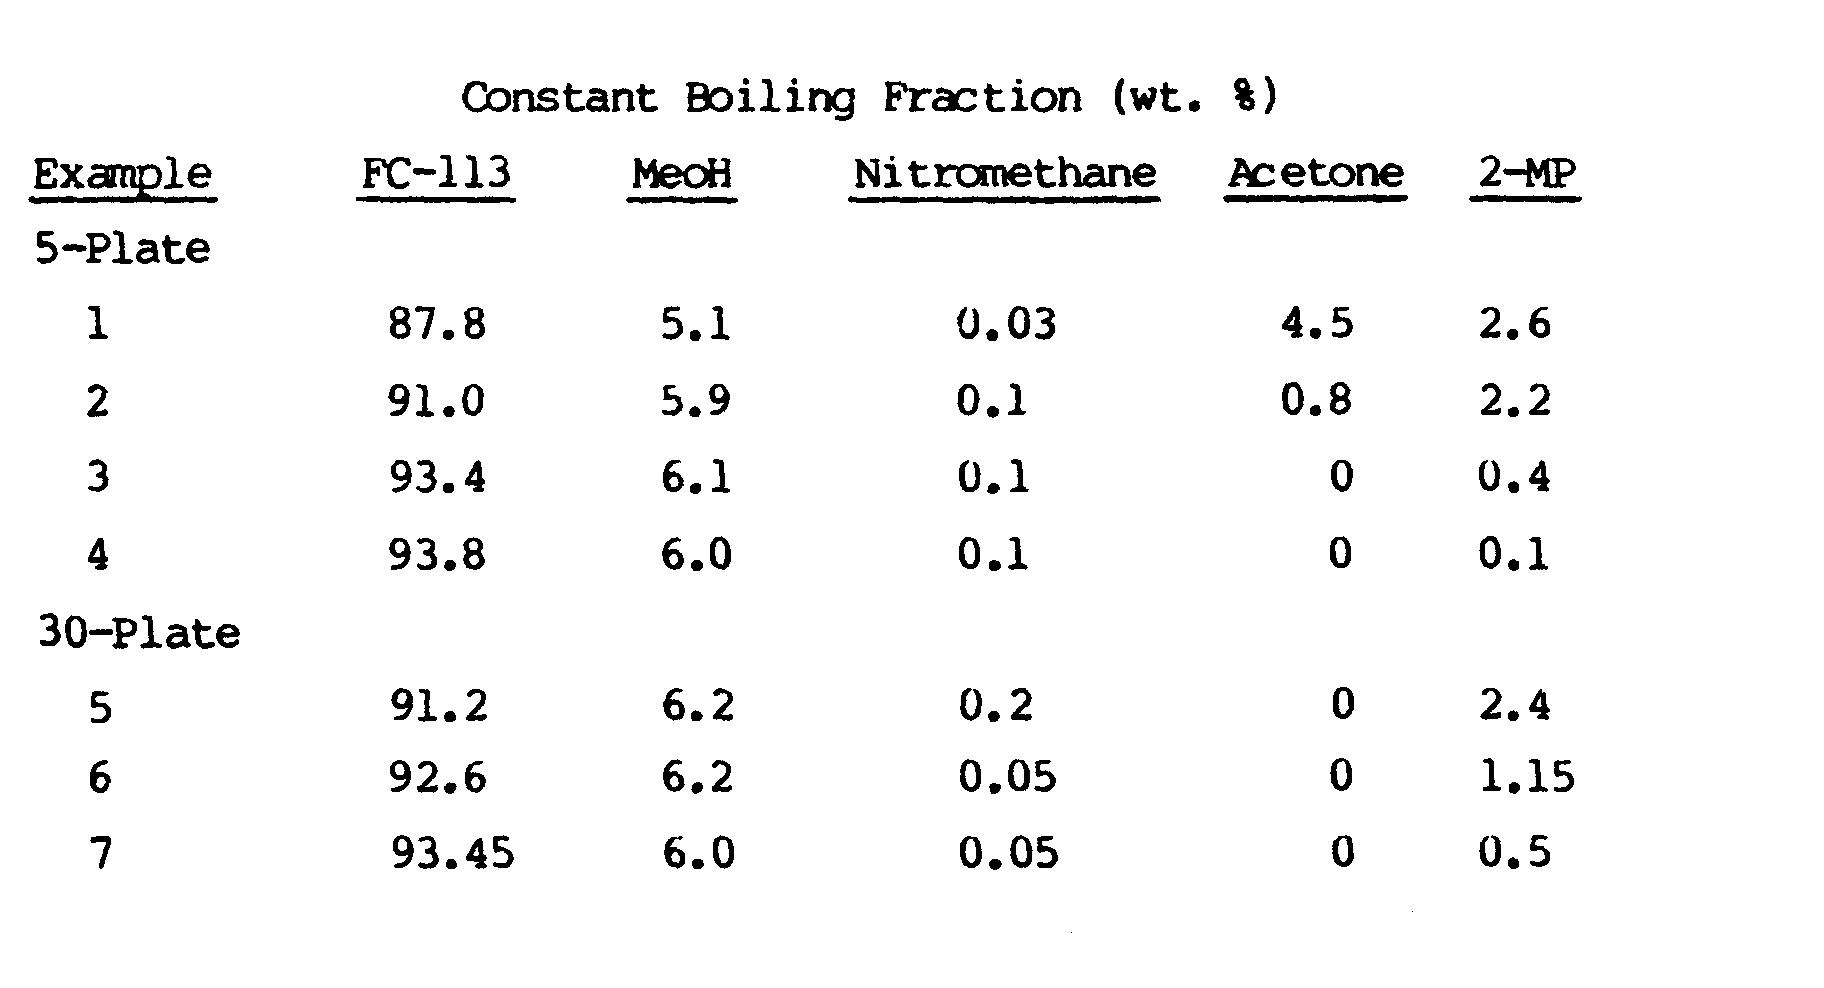 Azeotrope-like compositions of trichlorotrifluoroethane